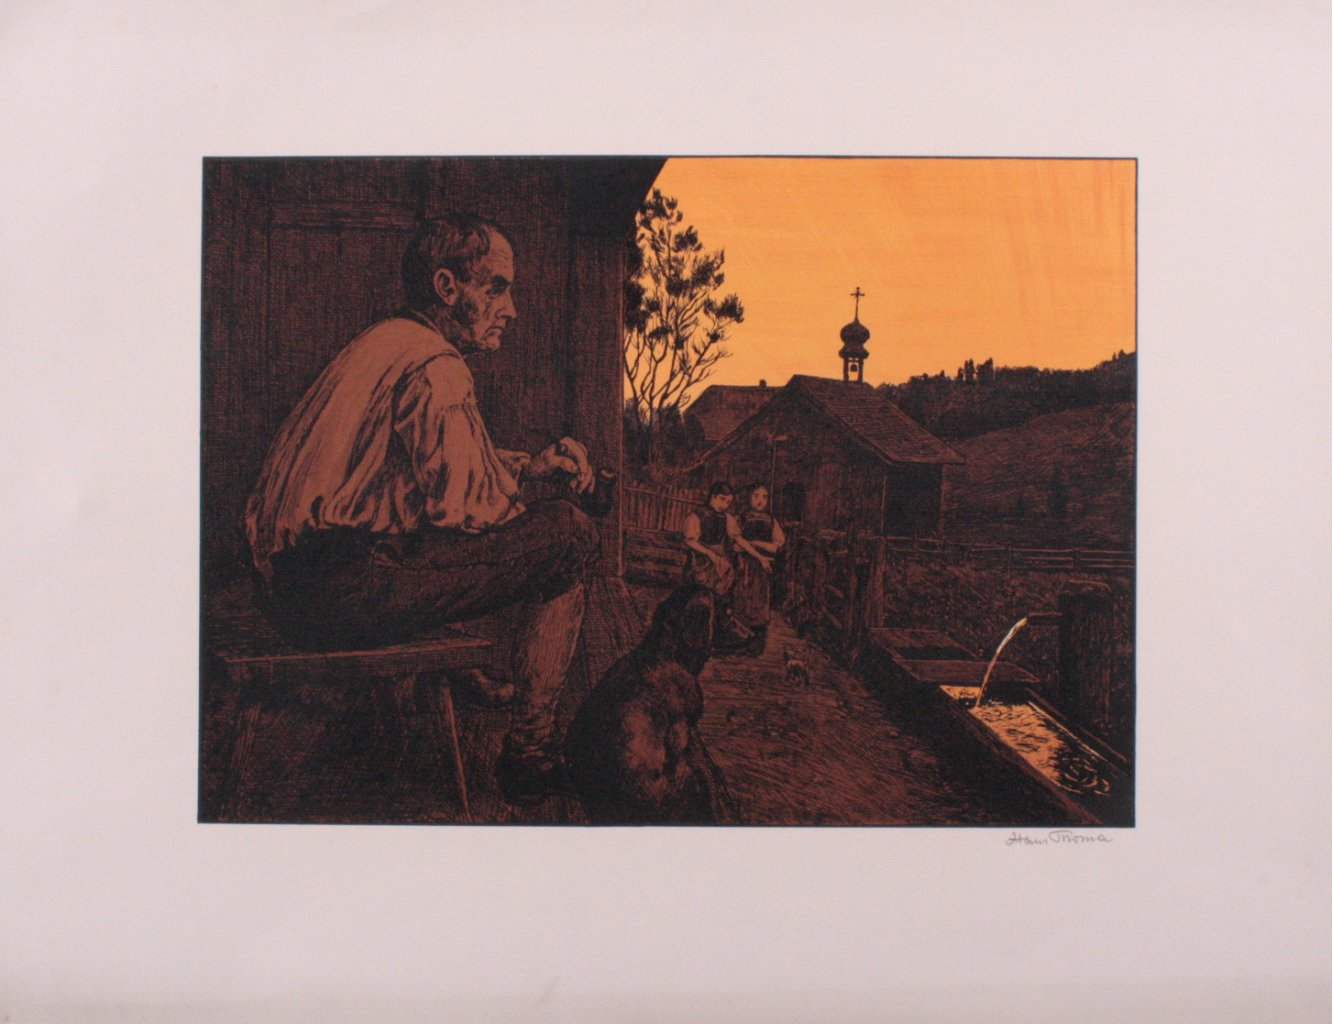 Hans Thoma 1839-1924. St. Anton bei Partenkirchen